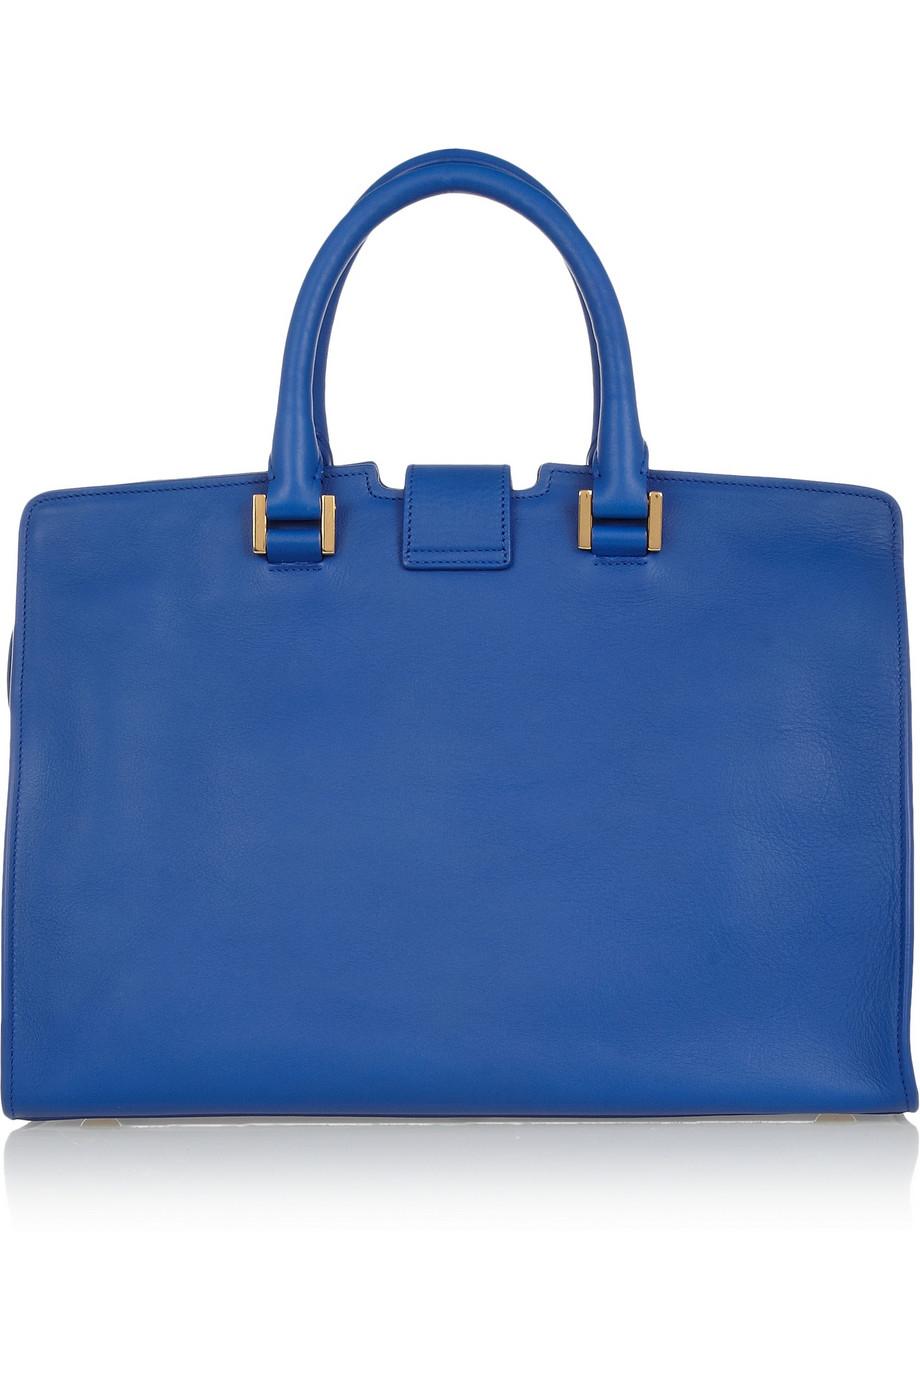 c9812081eb7f Lyst - Saint Laurent Ligne Classique Y Leather Tote in Blue